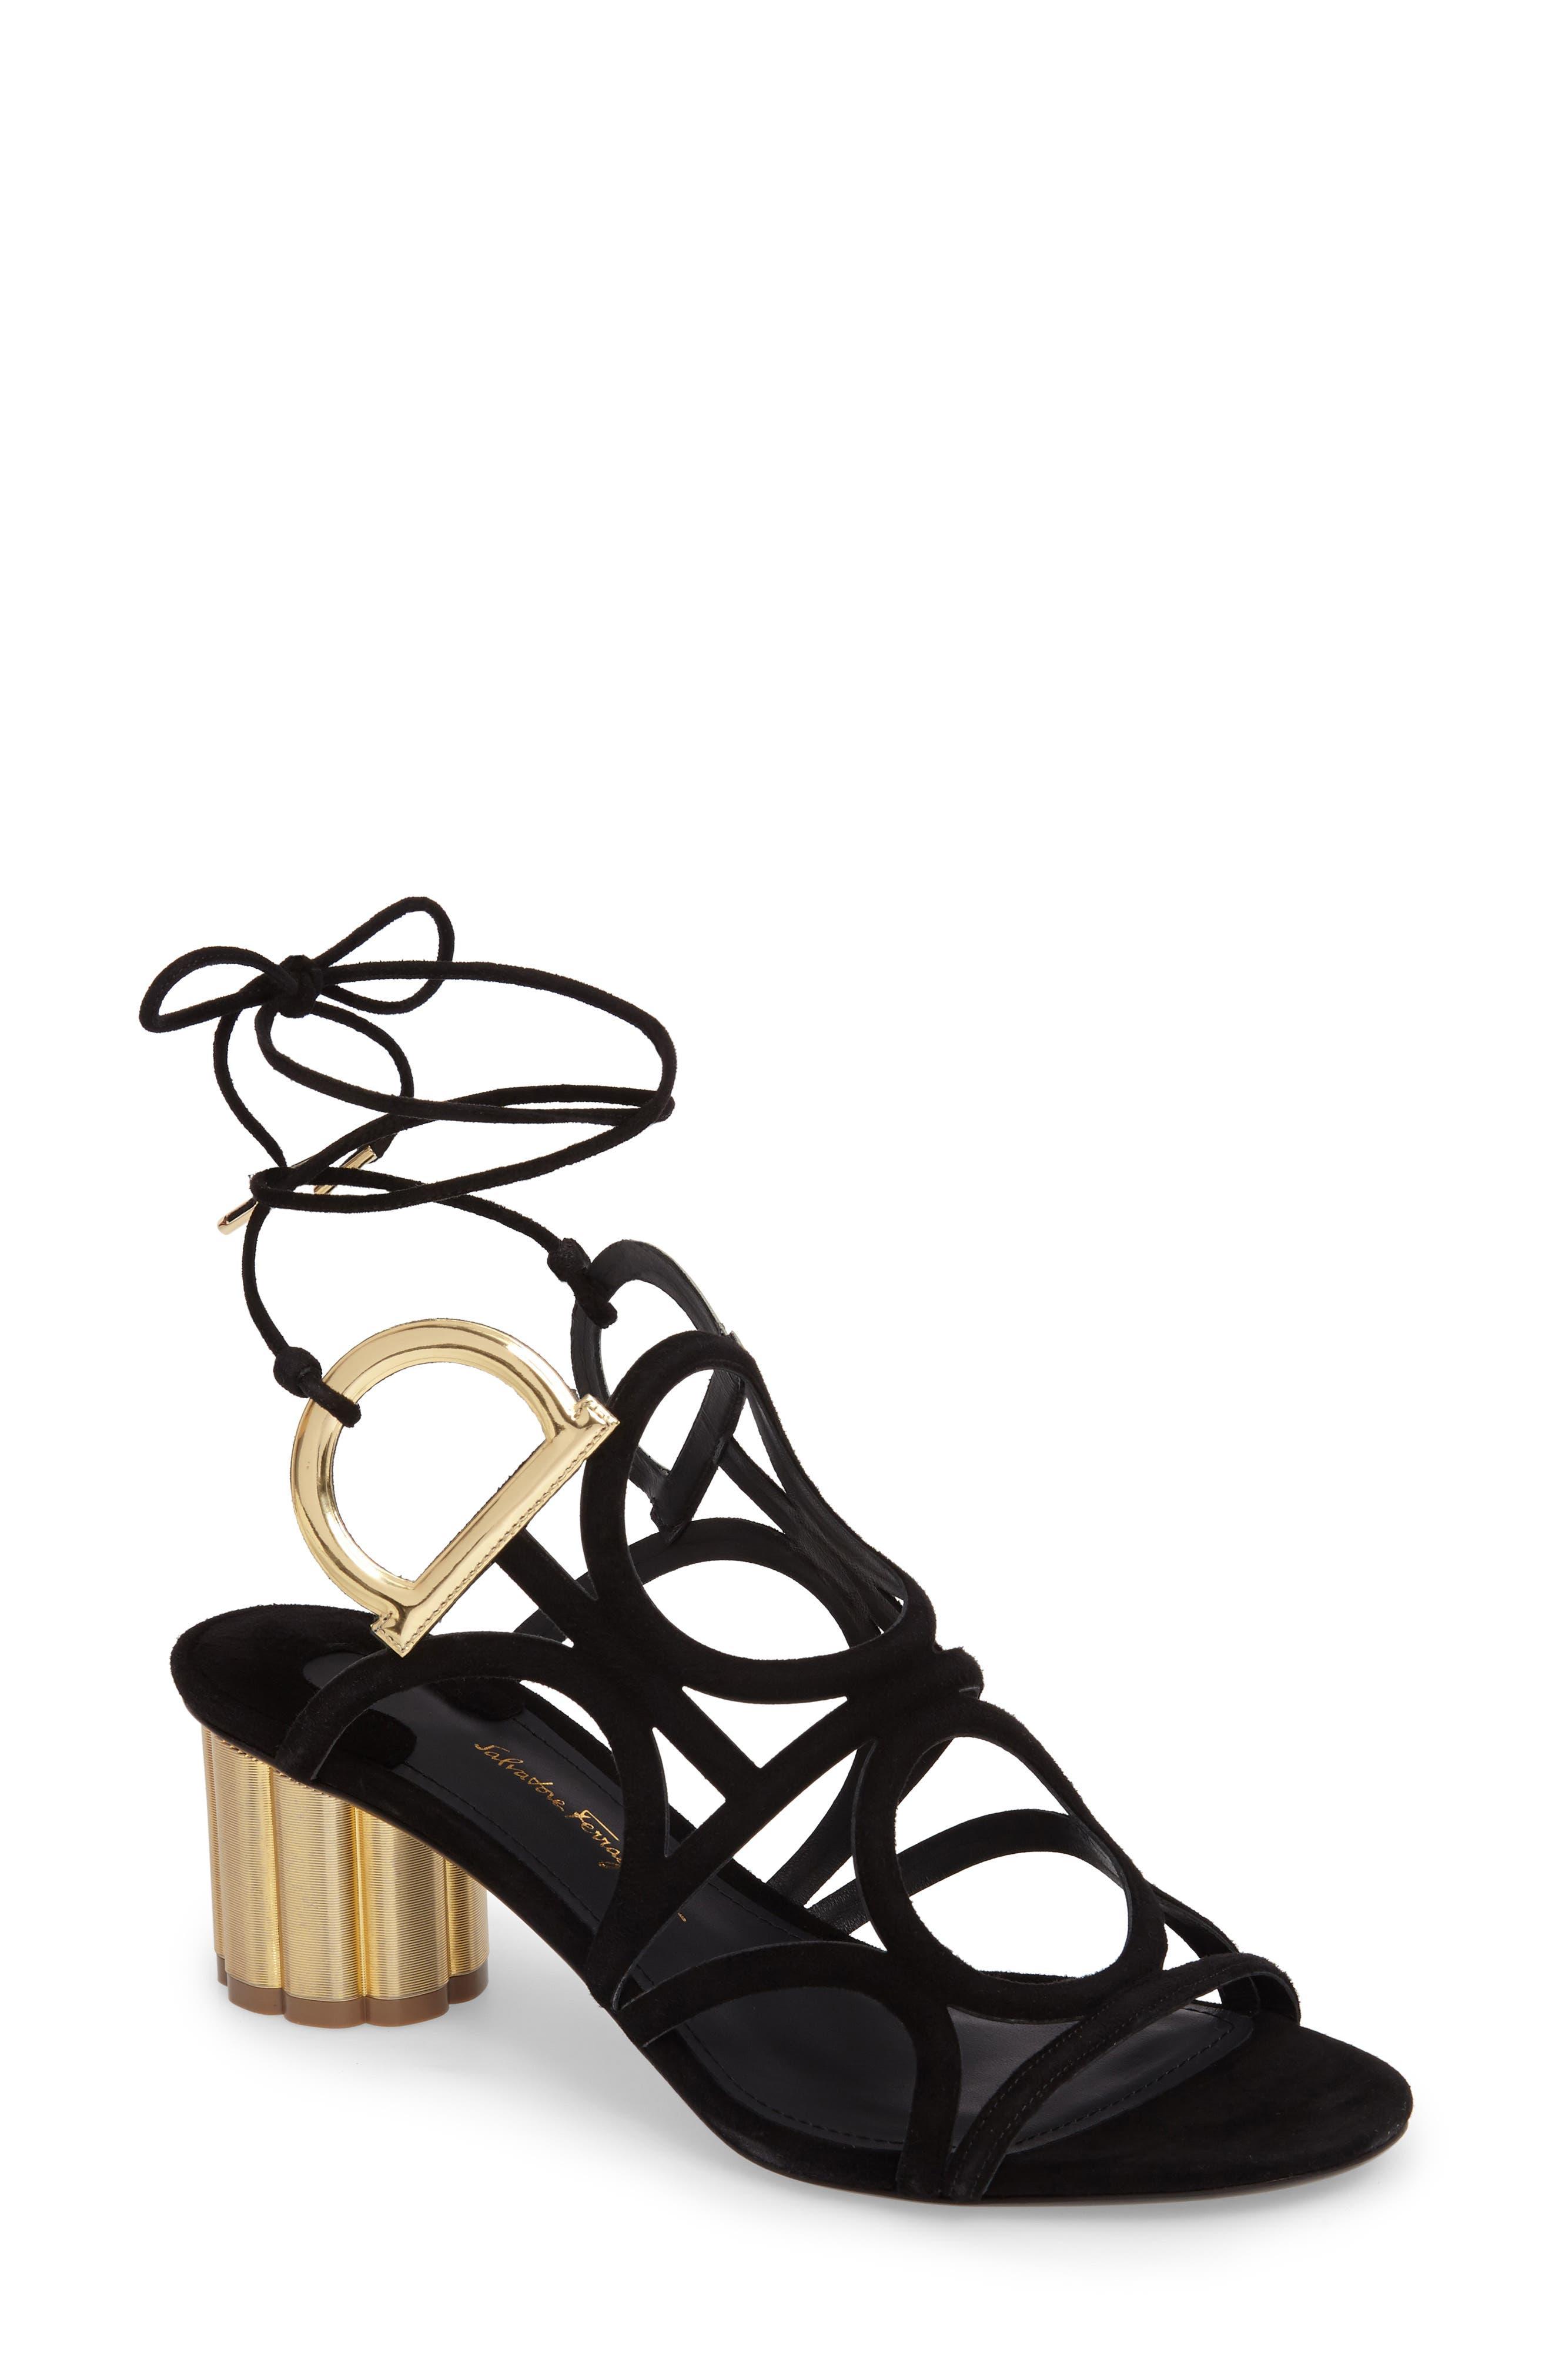 Main Image - Salvatore Ferragamo Strappy Block Heel Sandal (Women)